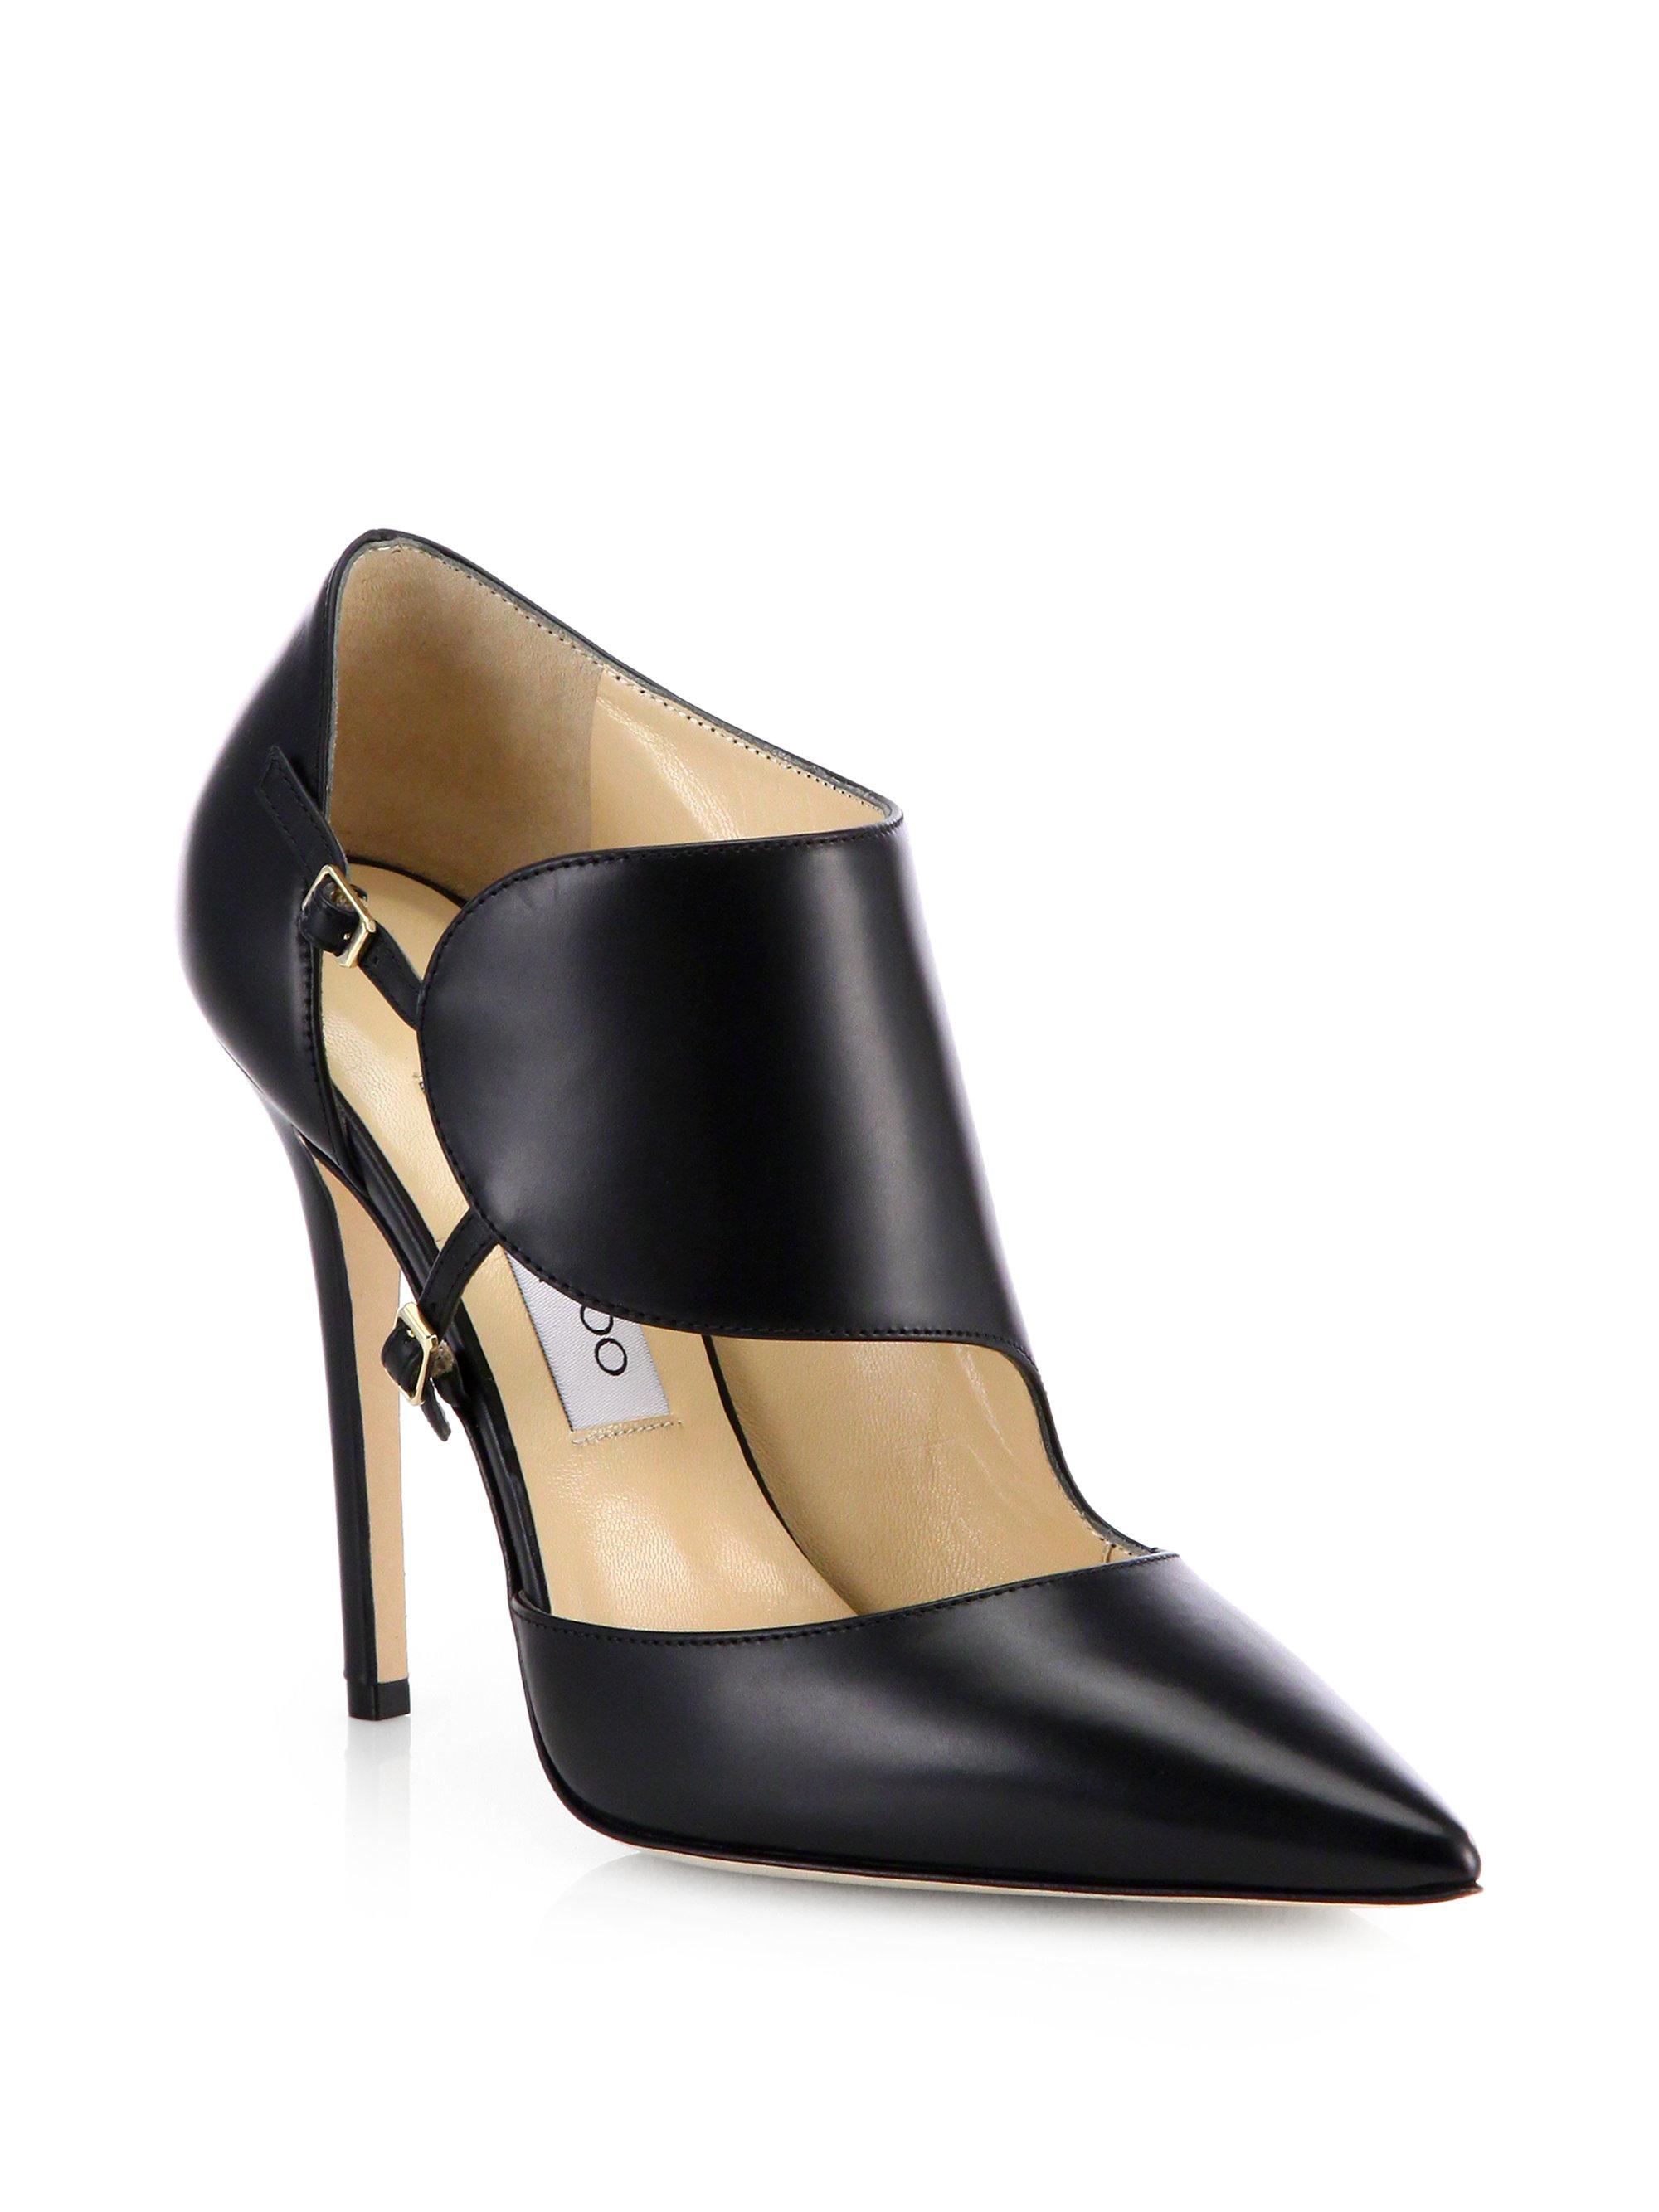 Awesome Womens Shoes Jimmy Choo Style TnUMqUrv